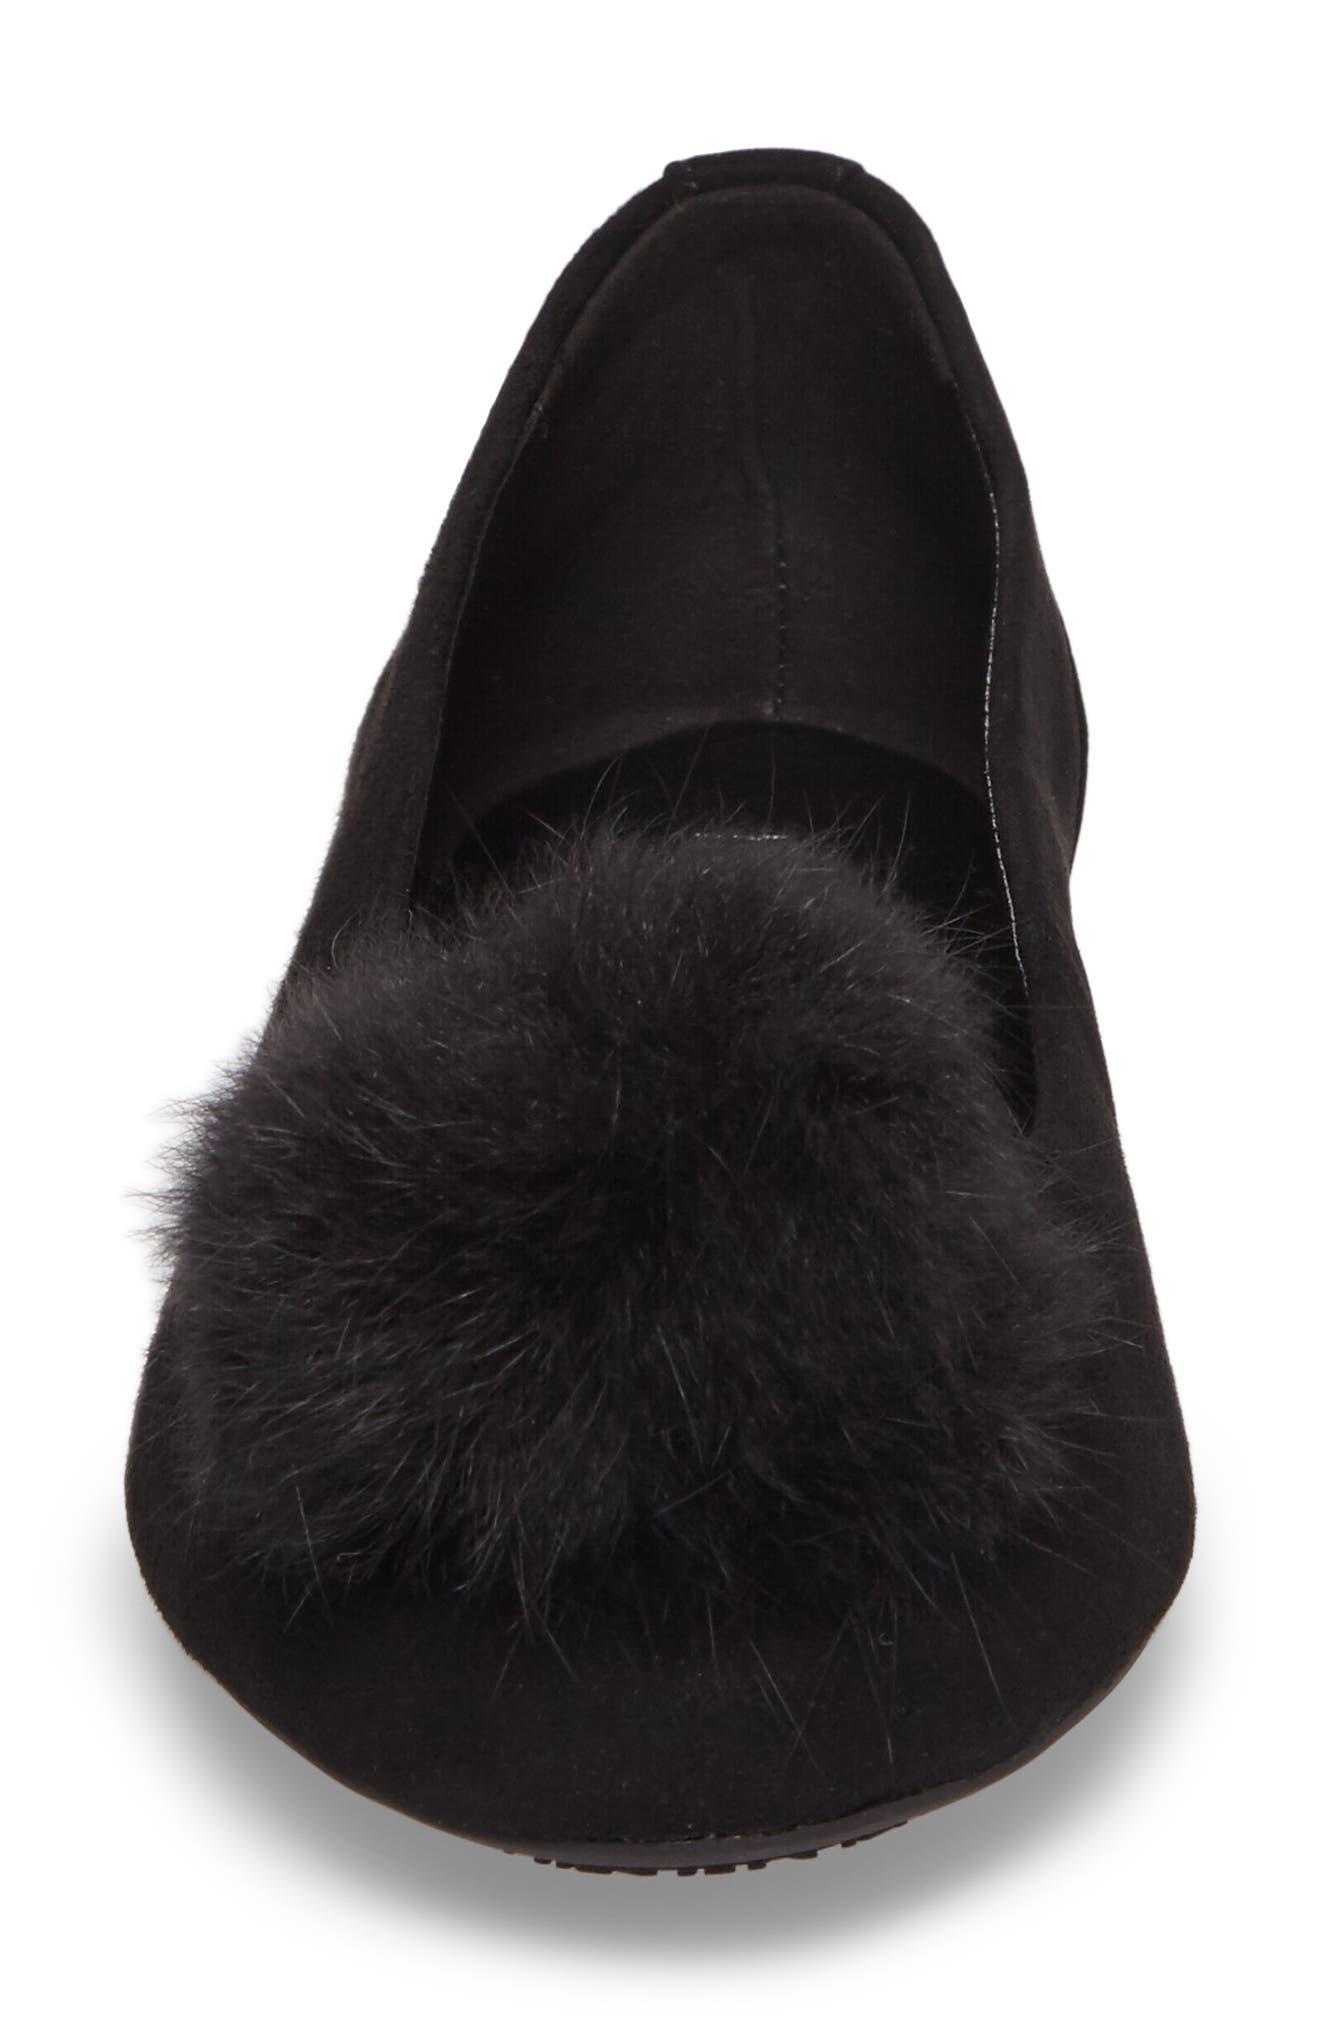 Remi Ballet Flat with Genuine Rabbit Fur Pom,                             Alternate thumbnail 4, color,                             Black Suede